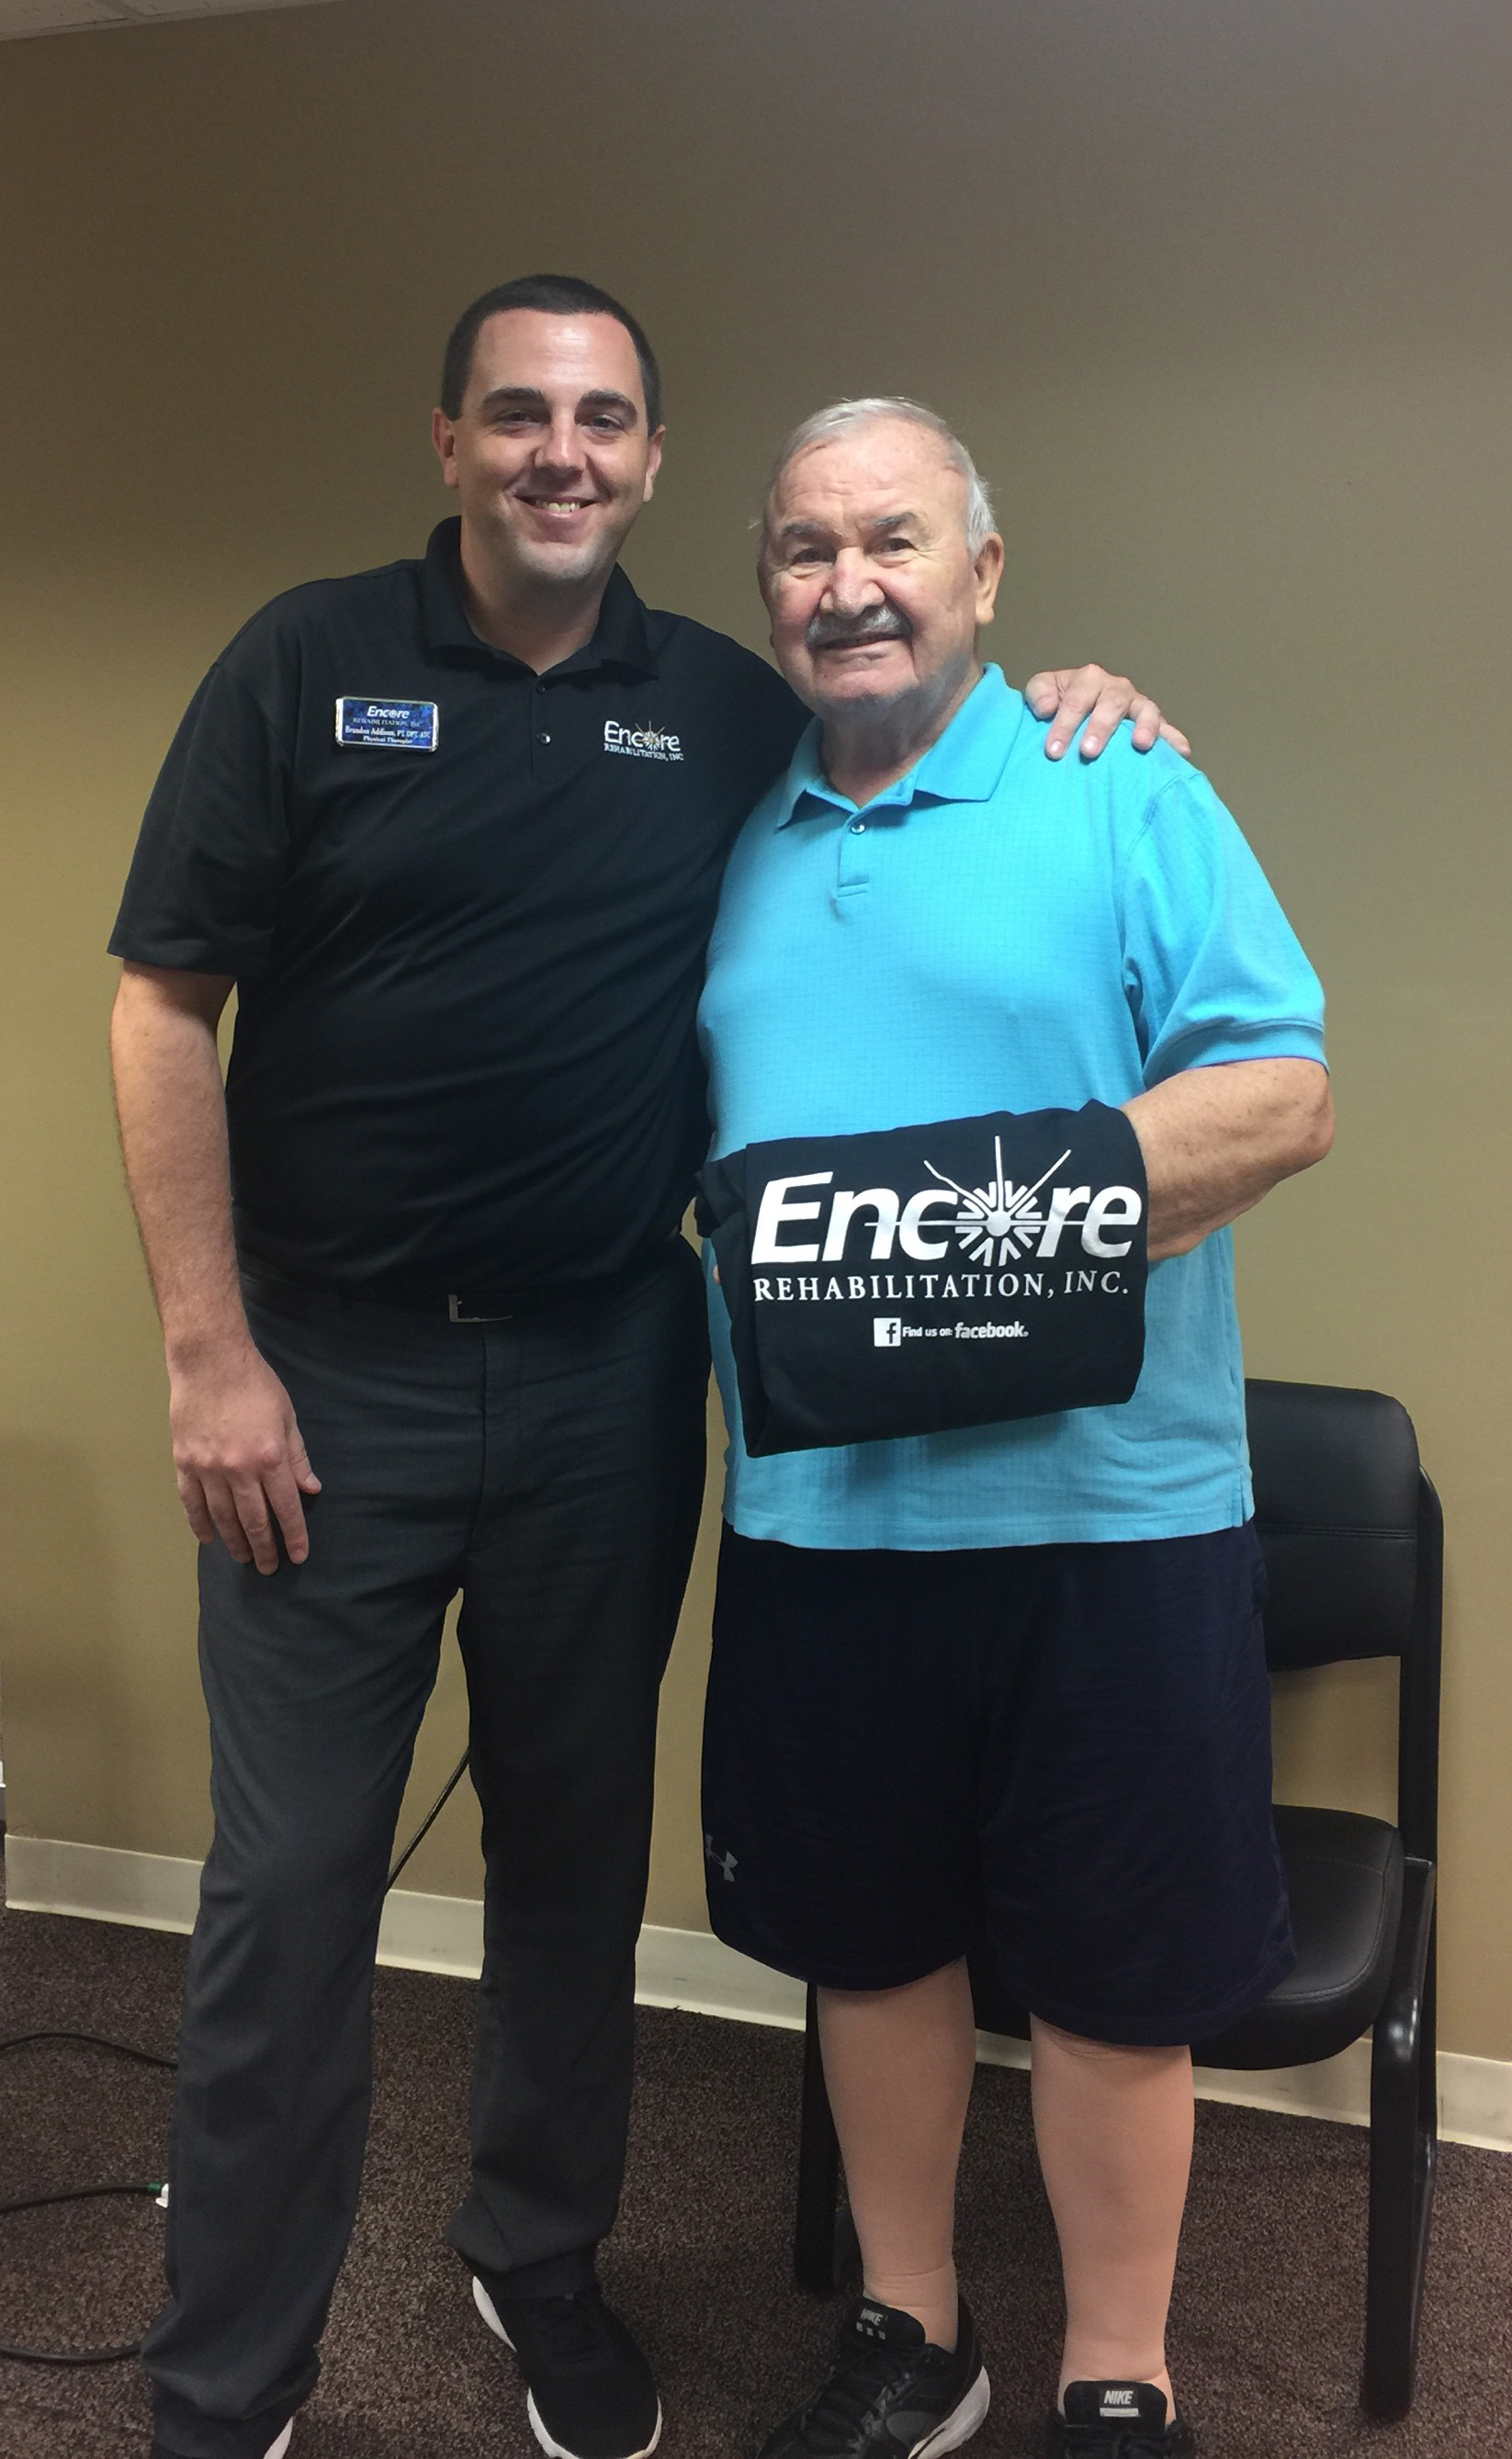 Ewald Jeltsch - Patient of the Month for Encore Rehabilitation-Eufaula, Alabama